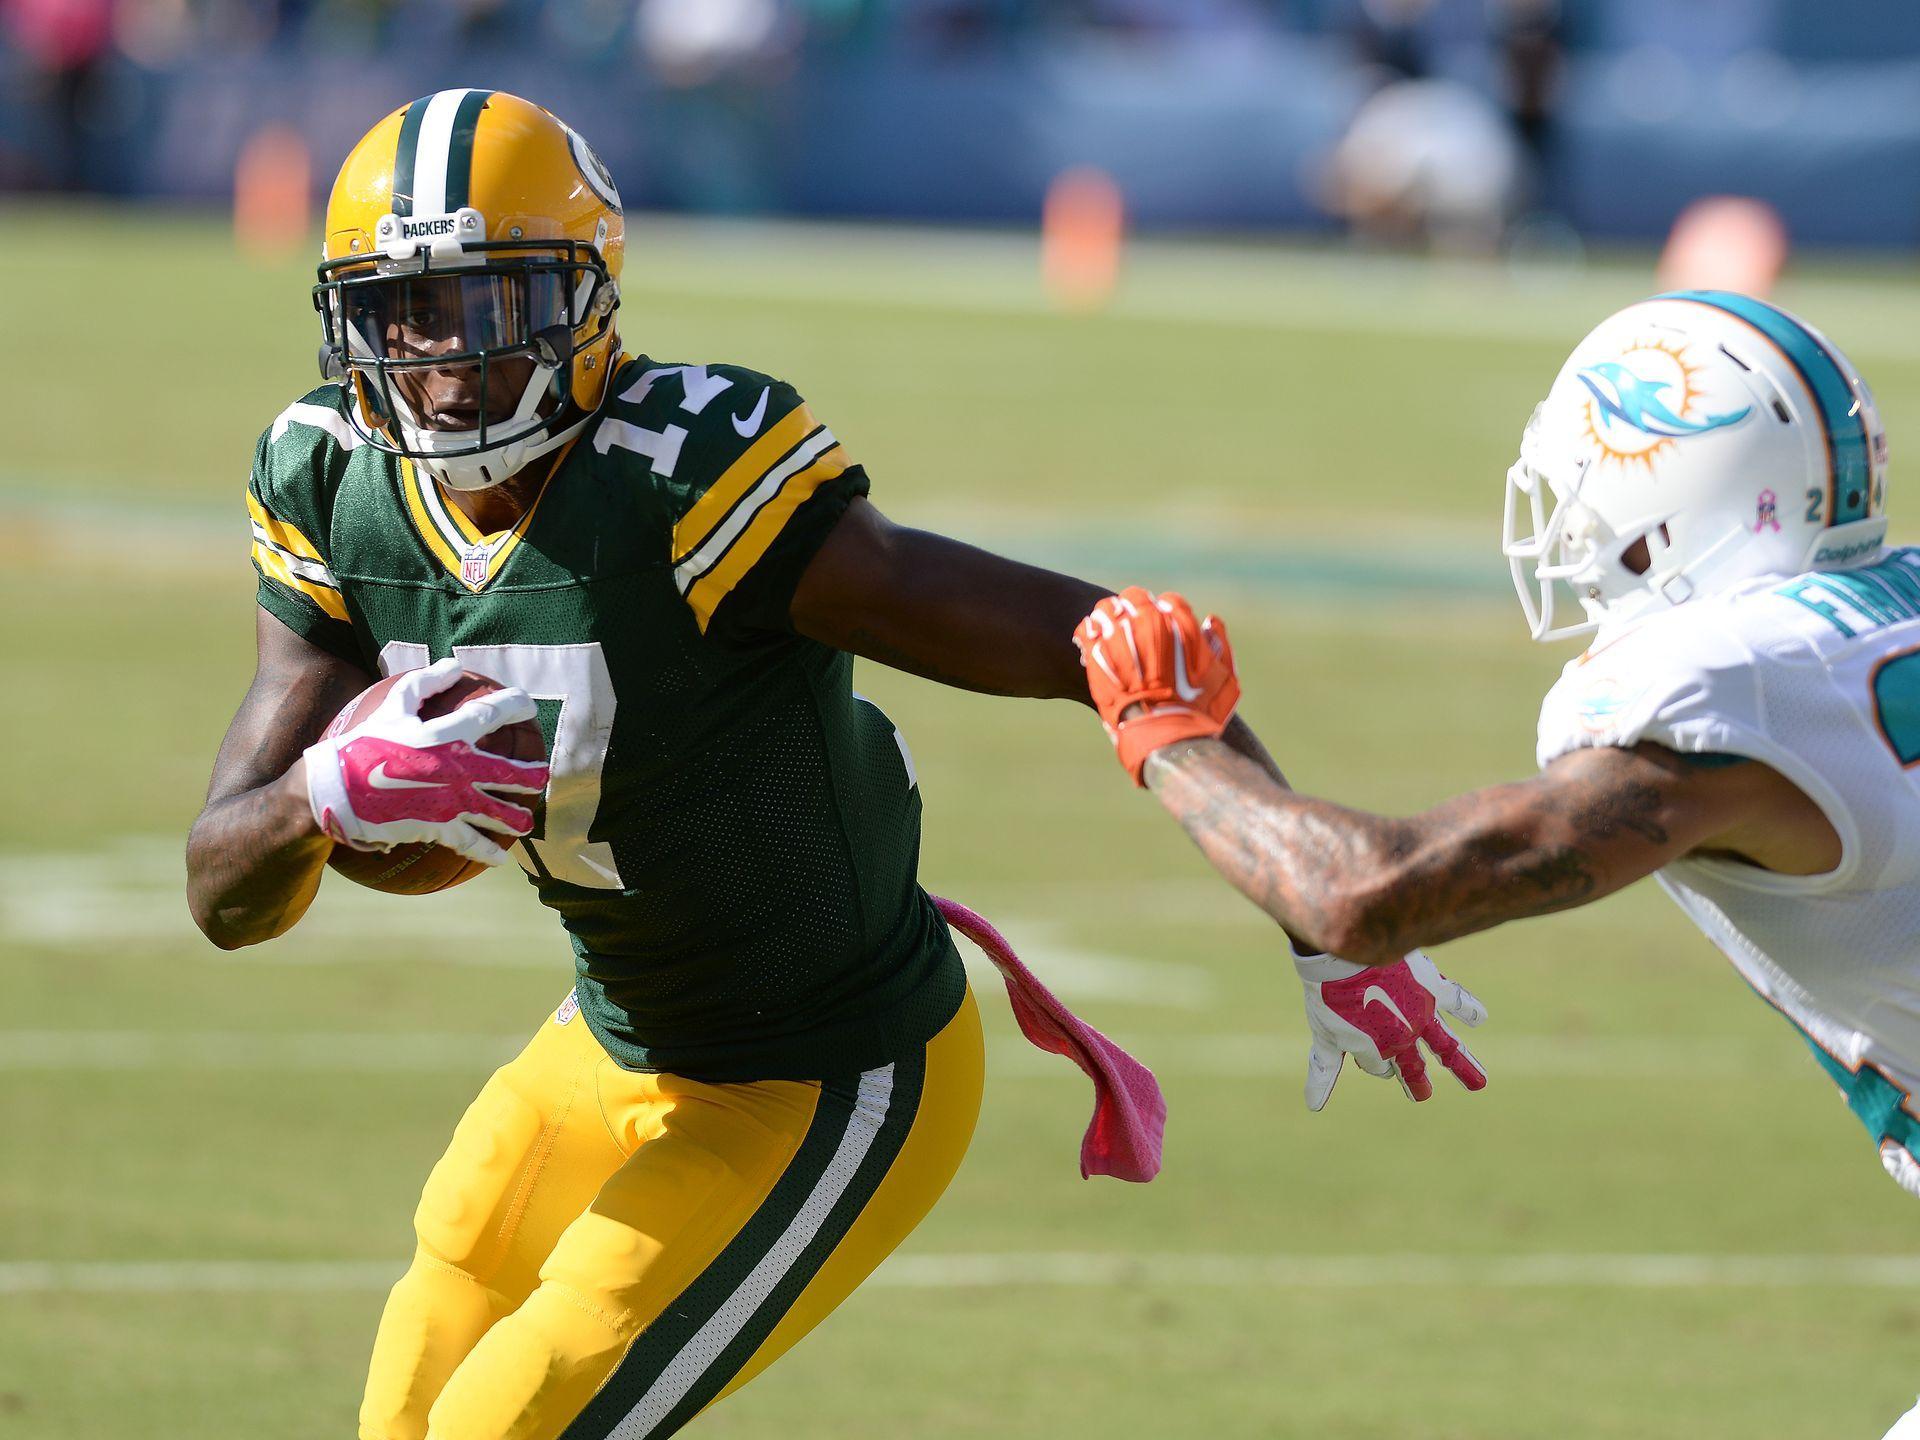 Green Bay Packers Receiver Davante Adams 17 Makes The Catch Against Cornerback Cortland Finnegan 24 On A Fake Spike Pla Green Bay Packers Packers Green Bay